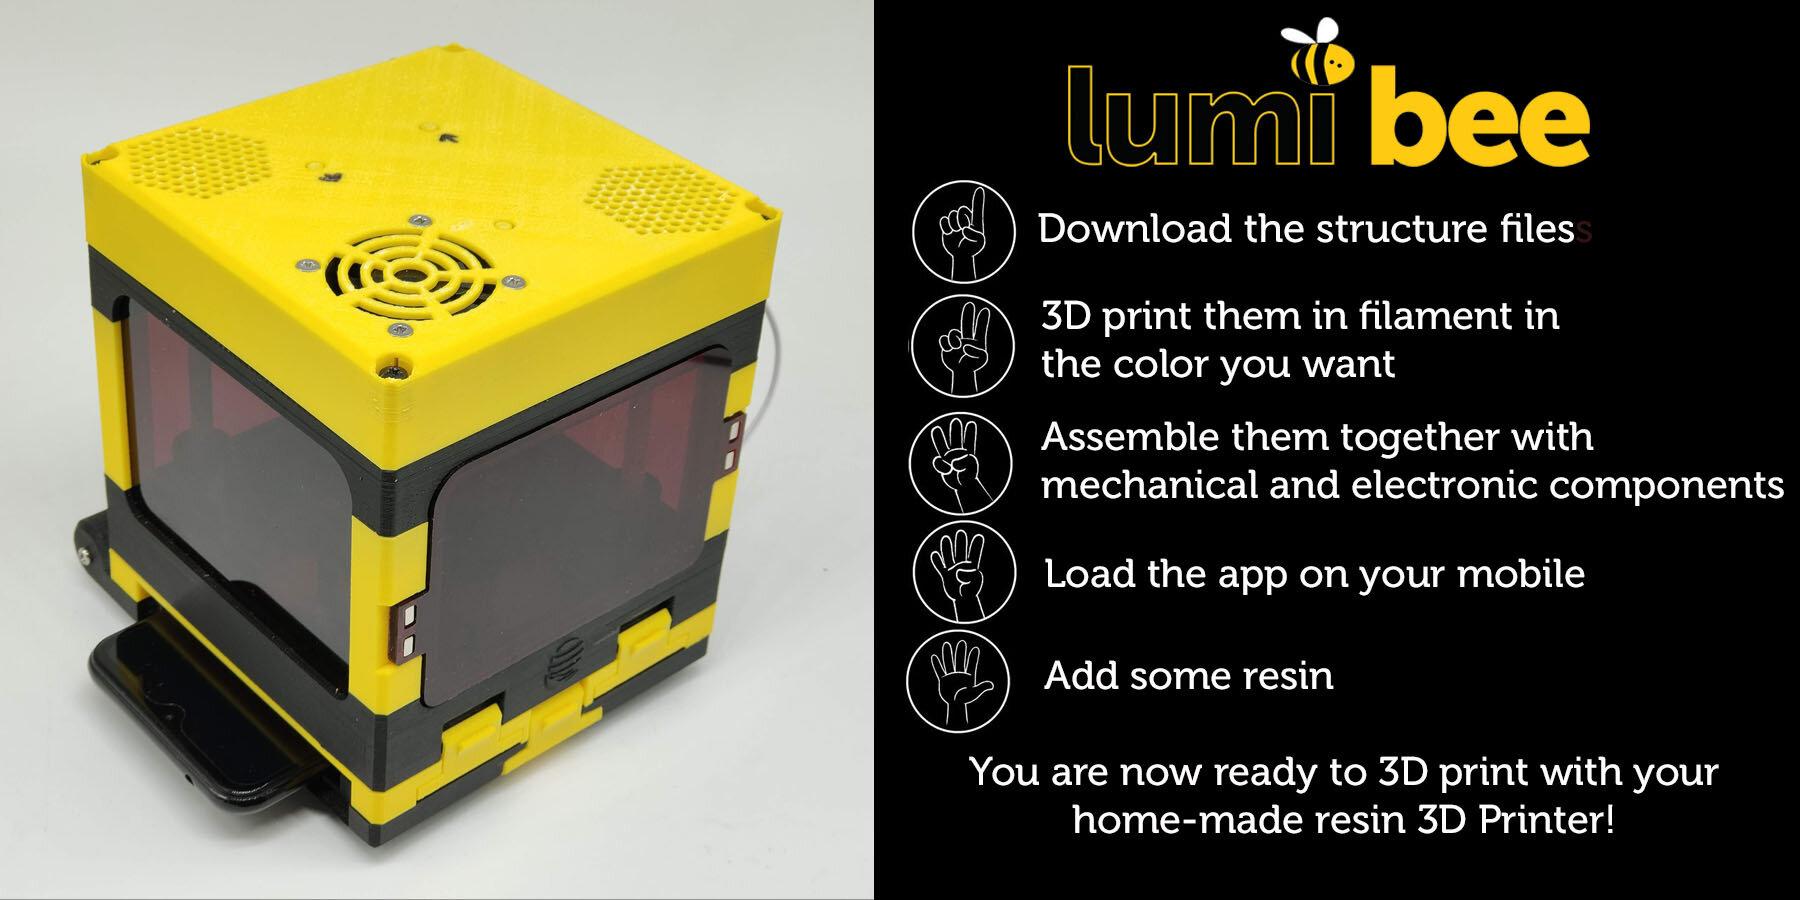 Lumibee_instructions.jpg